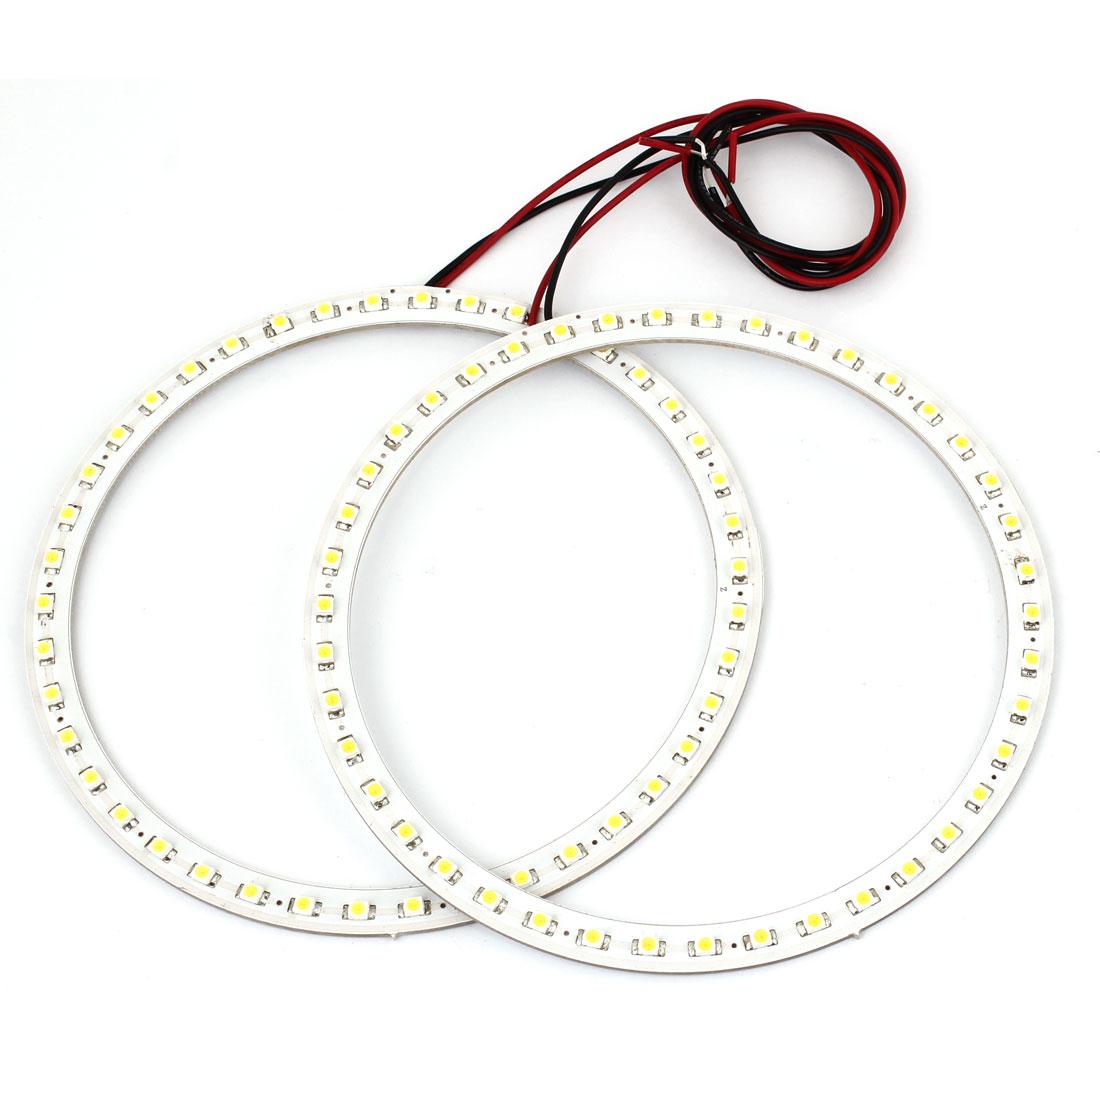 2 Pcs 13cm Dia 1210 SMD 42 LED Vehicle Car Angel Eyes Ring Lights Lamps White 12V